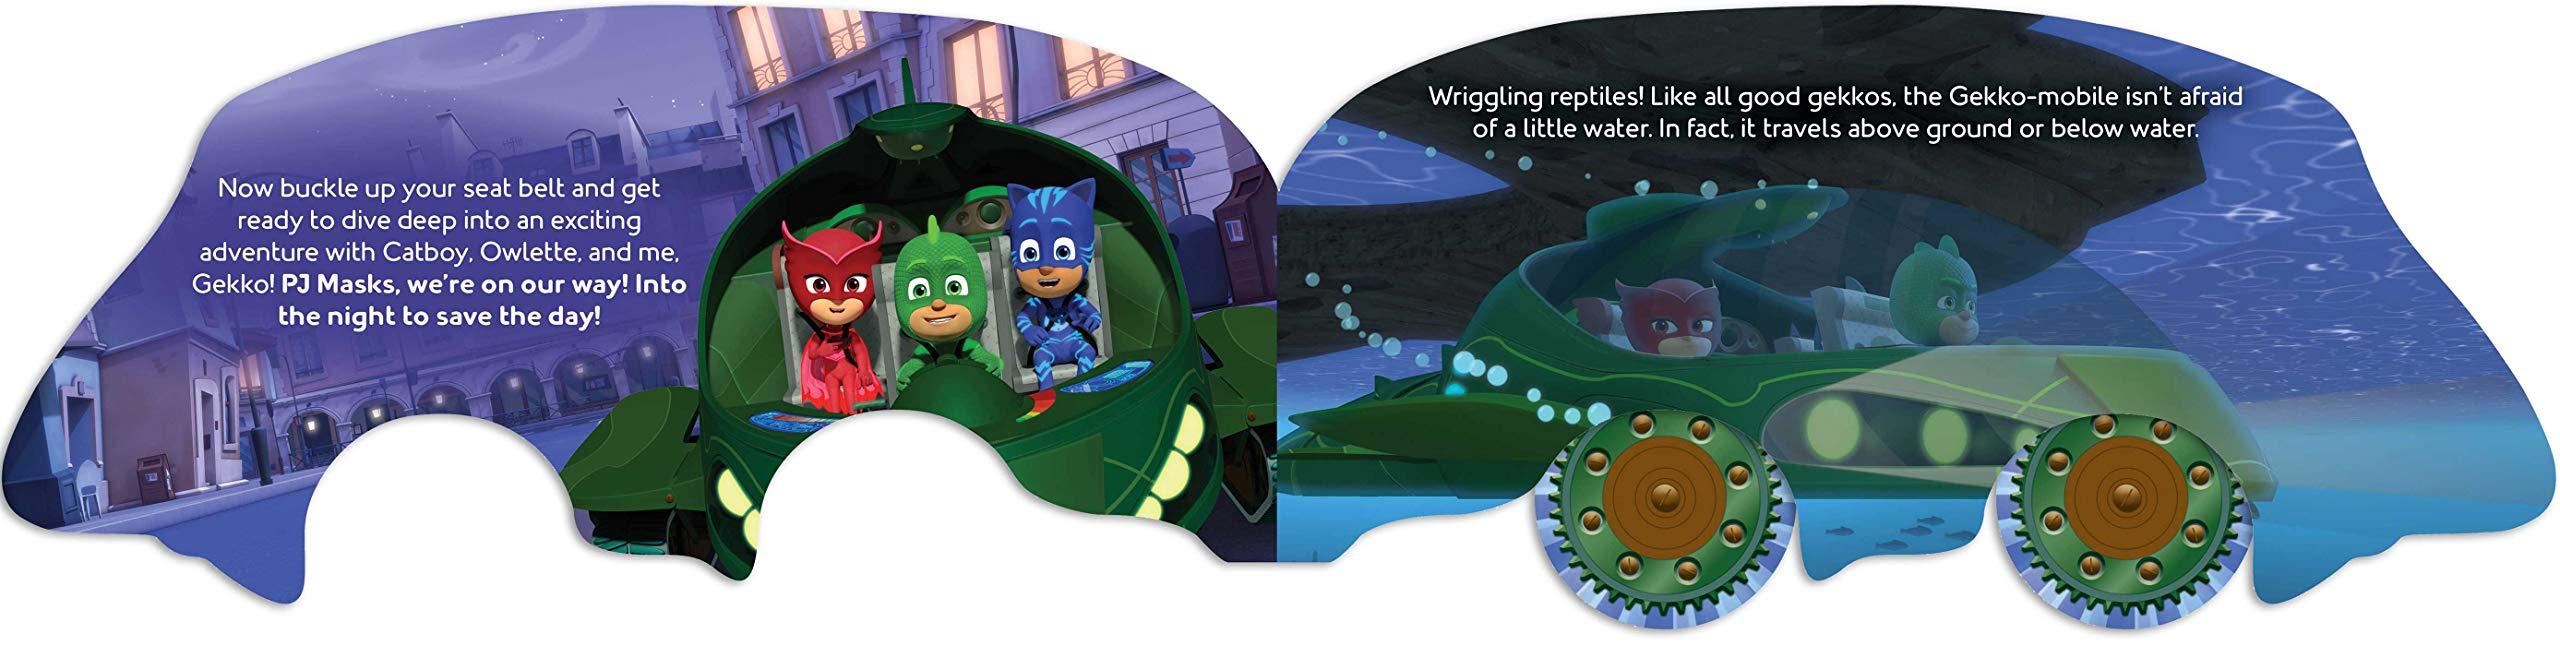 GO GO GEKKO MOBILE (PJ Masks) : Dingee, A. E.: Amazon.es: Libros